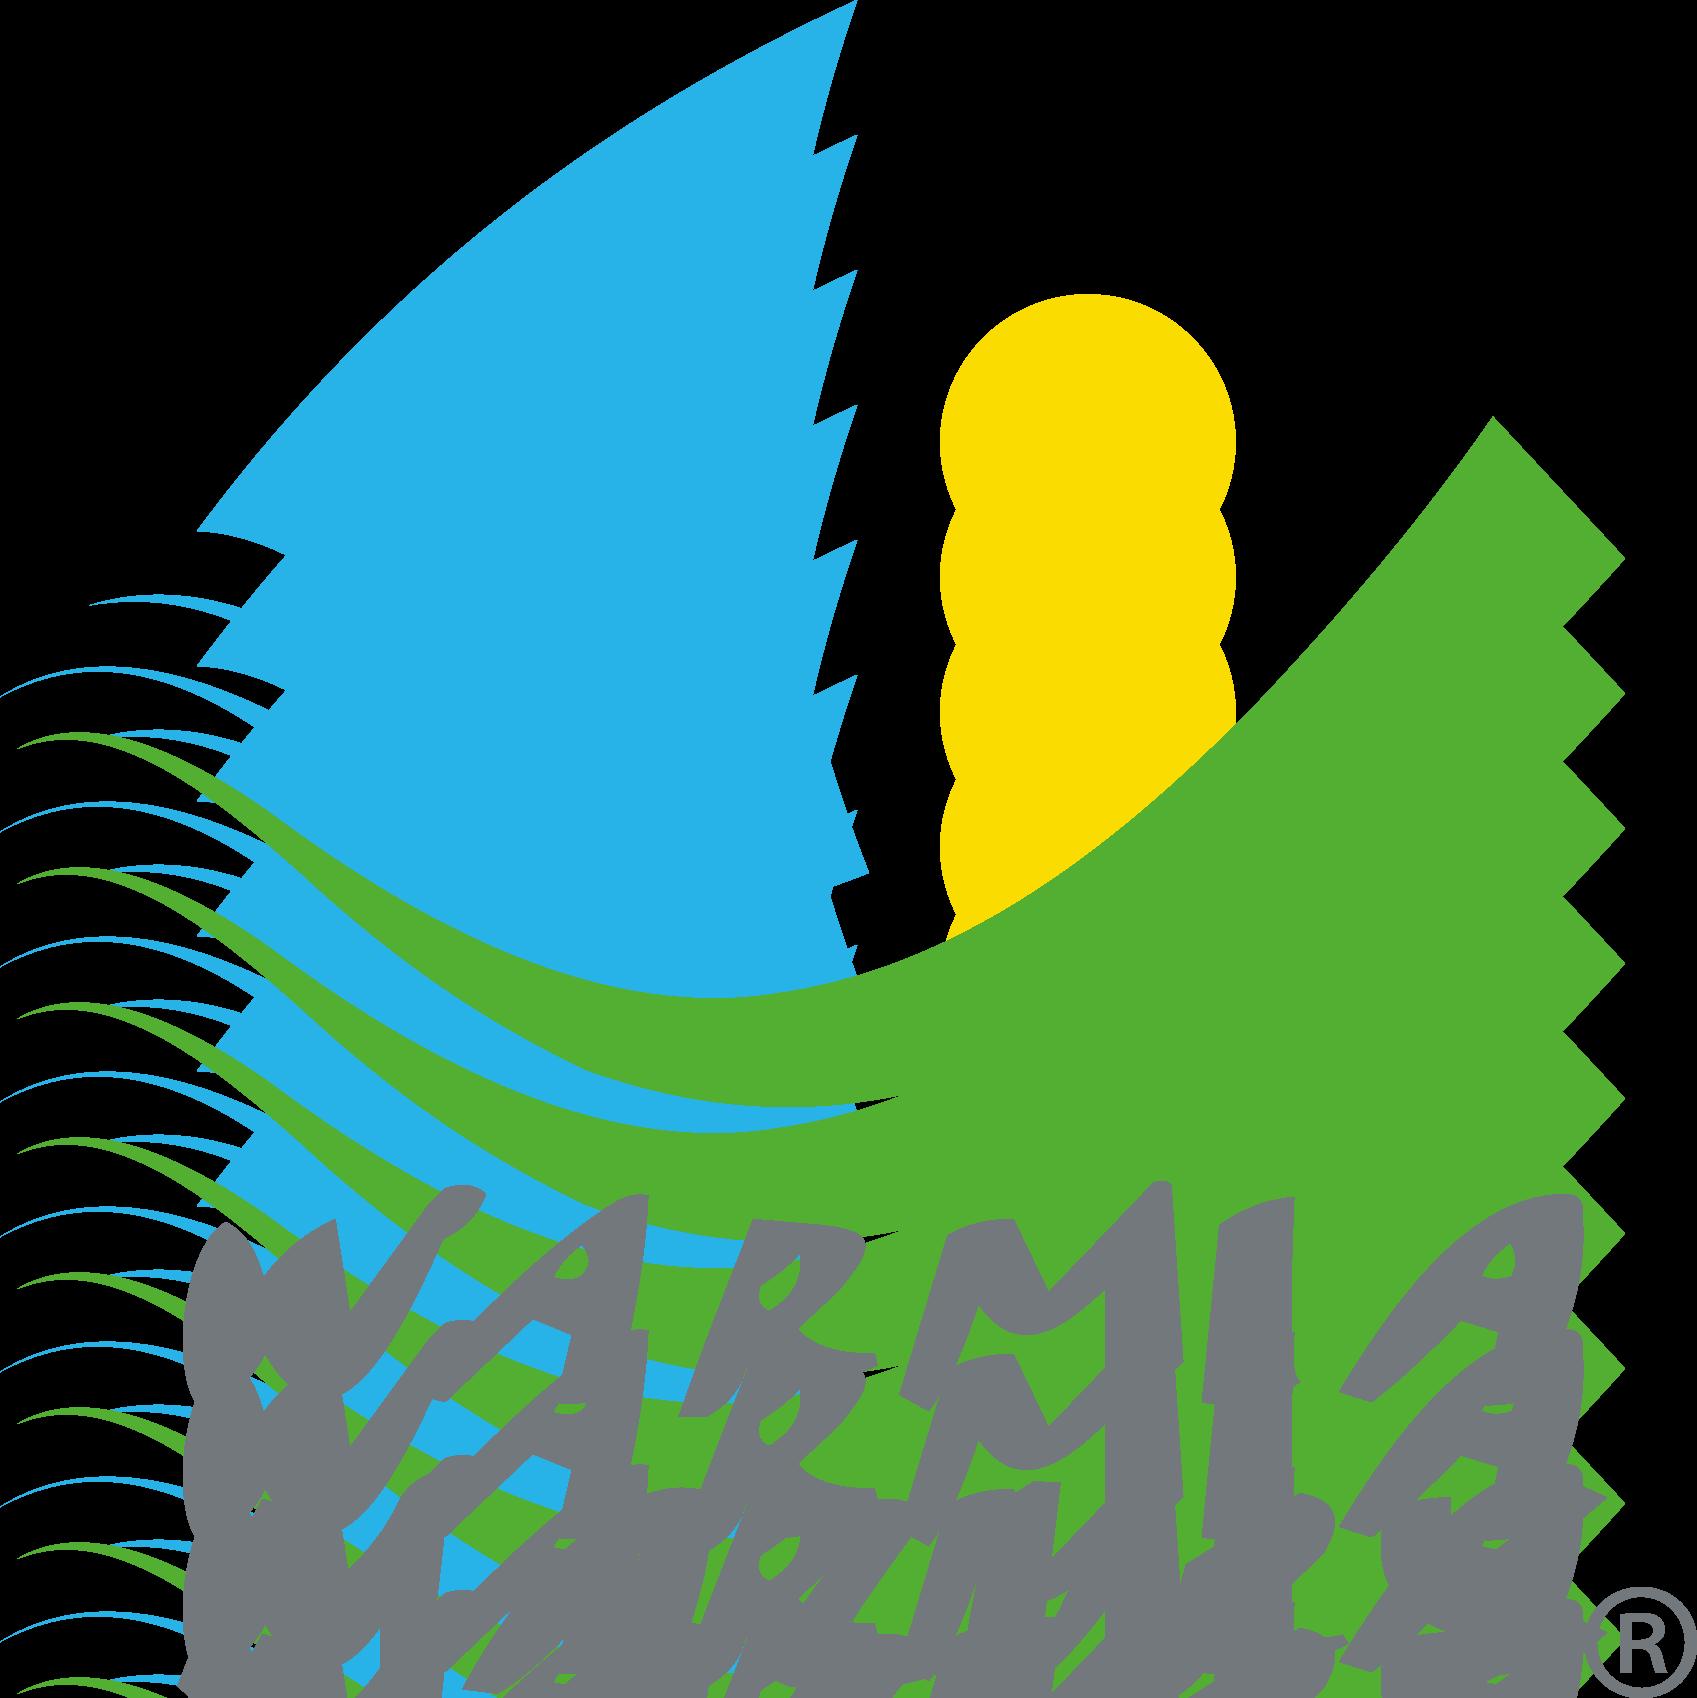 Warmian-Masurian Voivodeship Voivodeship in Poland